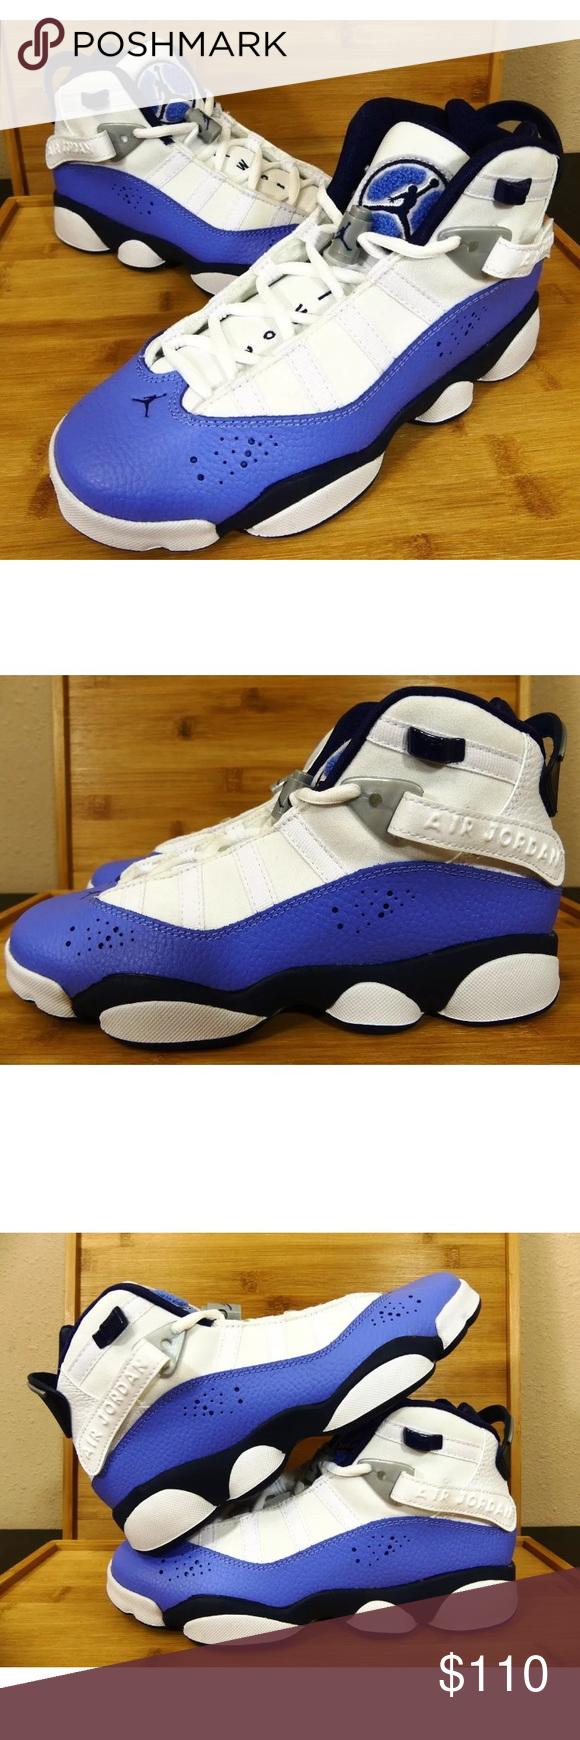 557807e9ce40db Kid s Nike Air Jordan 6 Rings Size 5.5Y Womens 7.5 NWT in 2018